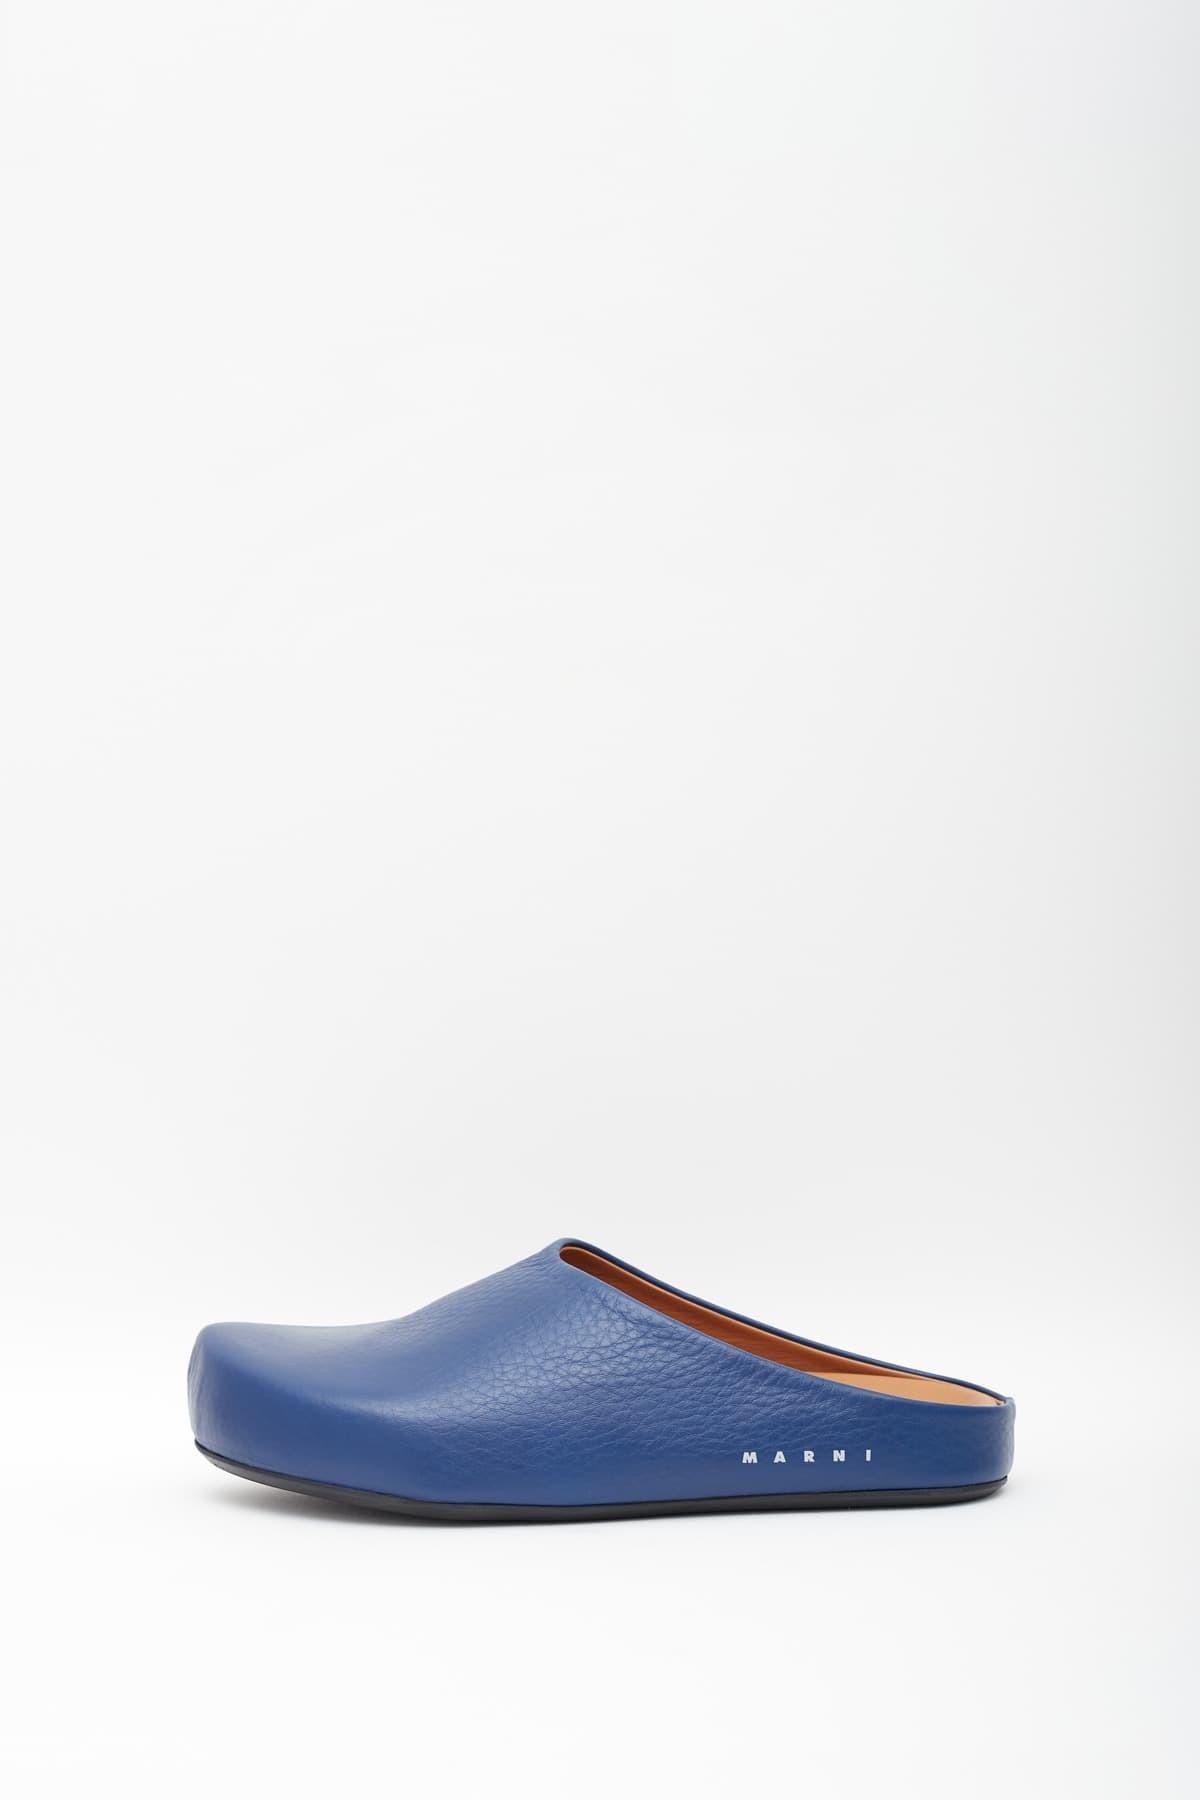 Comprar Marni Black Houndstooth Check Chino Trouser